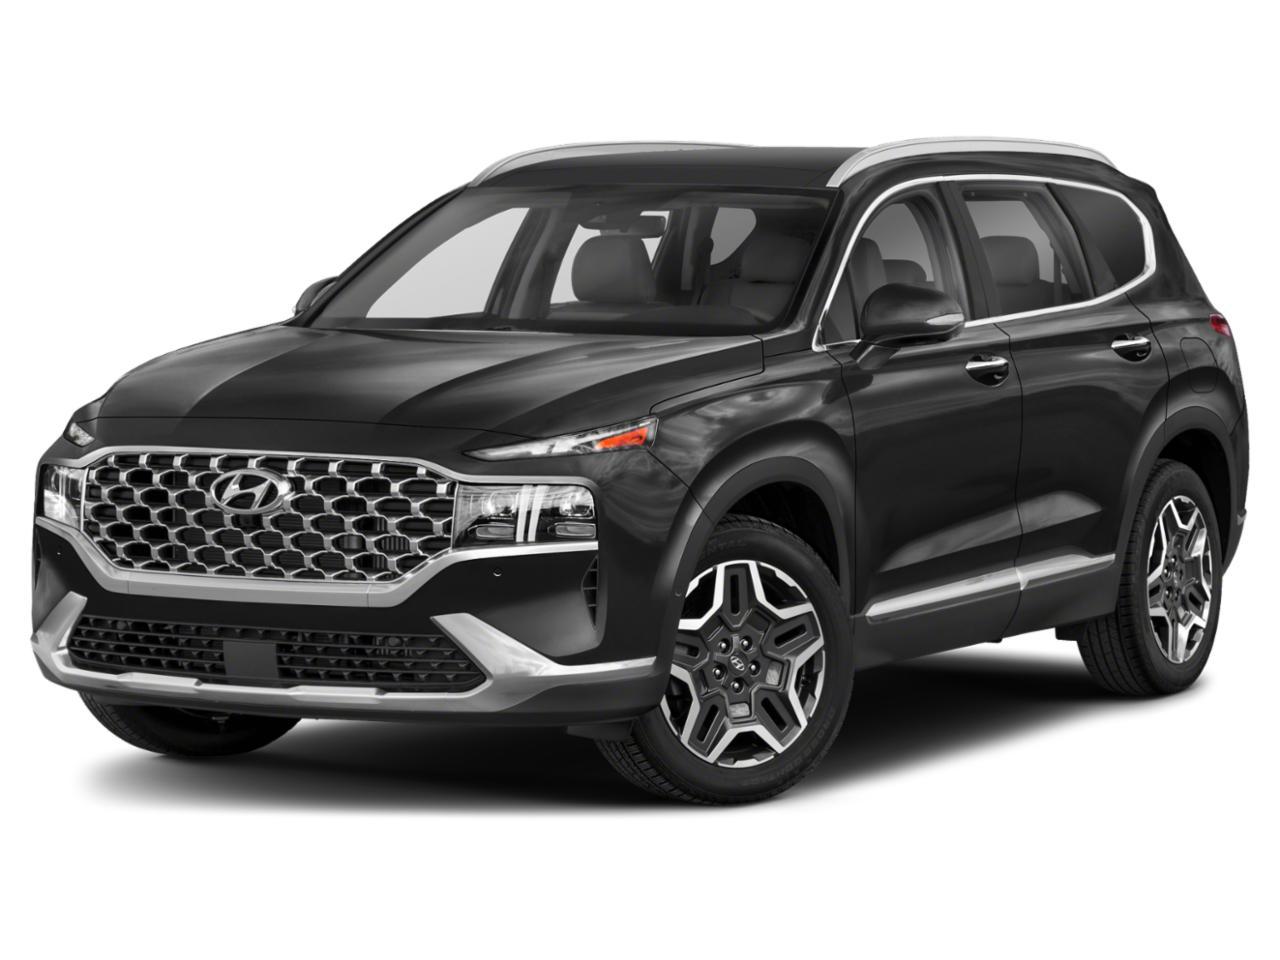 2022 Hyundai Santa Fe Vehicle Photo in Odessa, TX 79762